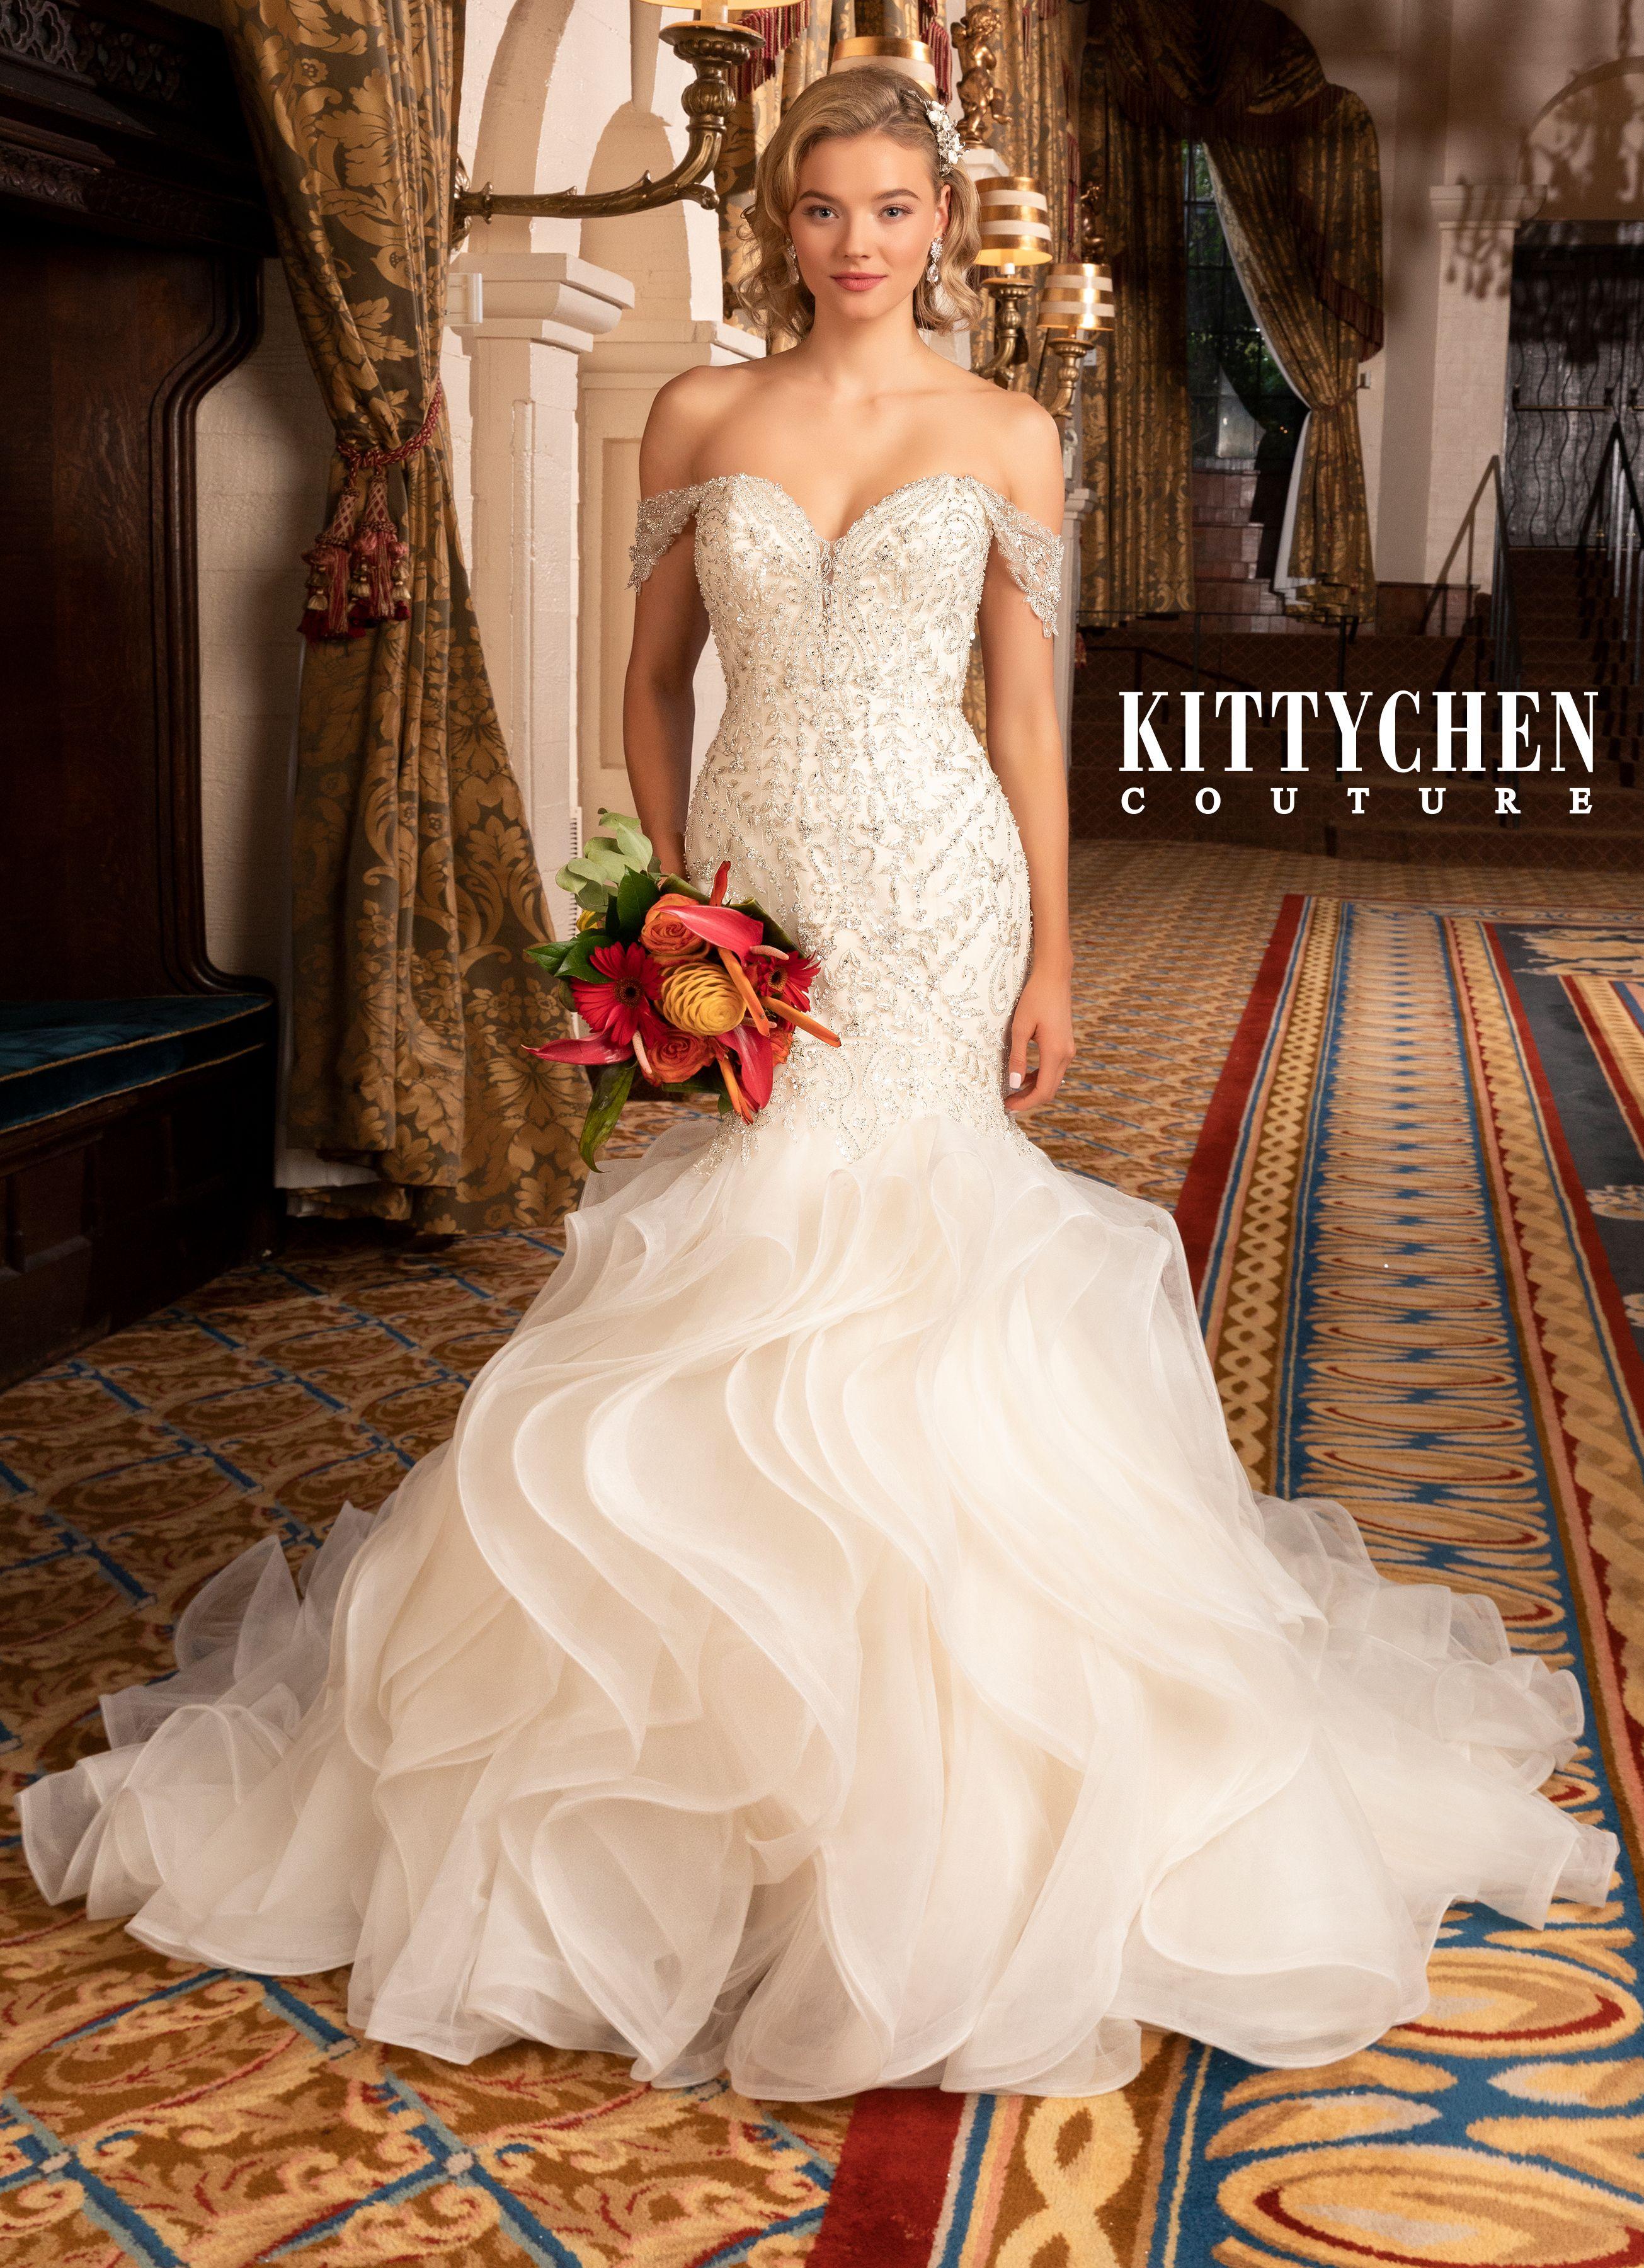 Destination wedding dress image by KittyChen on 2020 Kitty